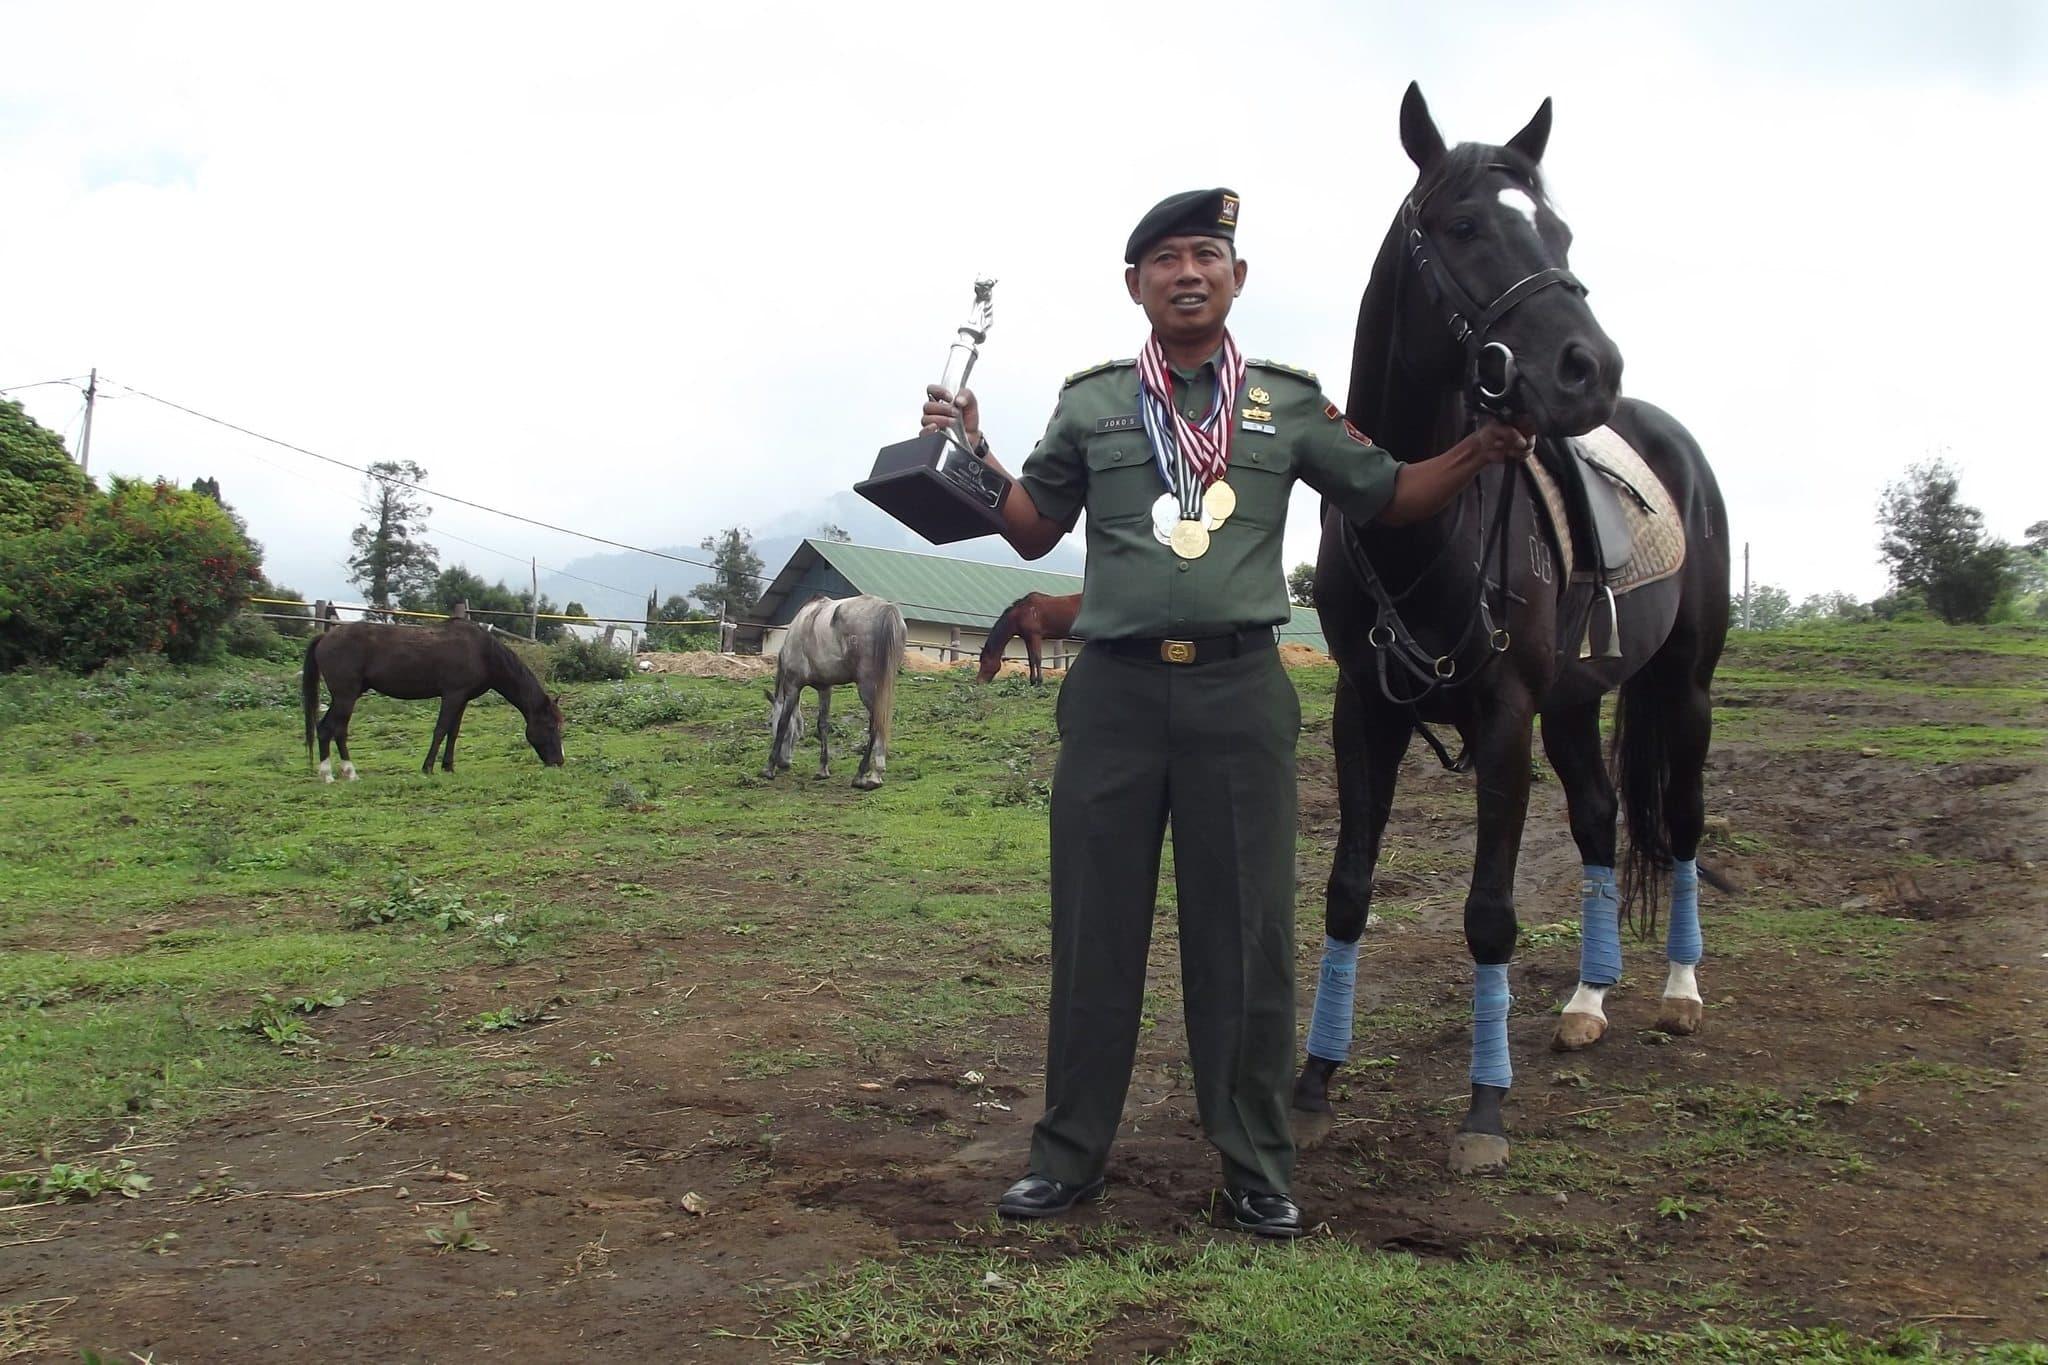 Kisah Inspiratif Mayor (Ckm) drh Joko Suranto, Satu-satunya Dokter Kuda di TNI